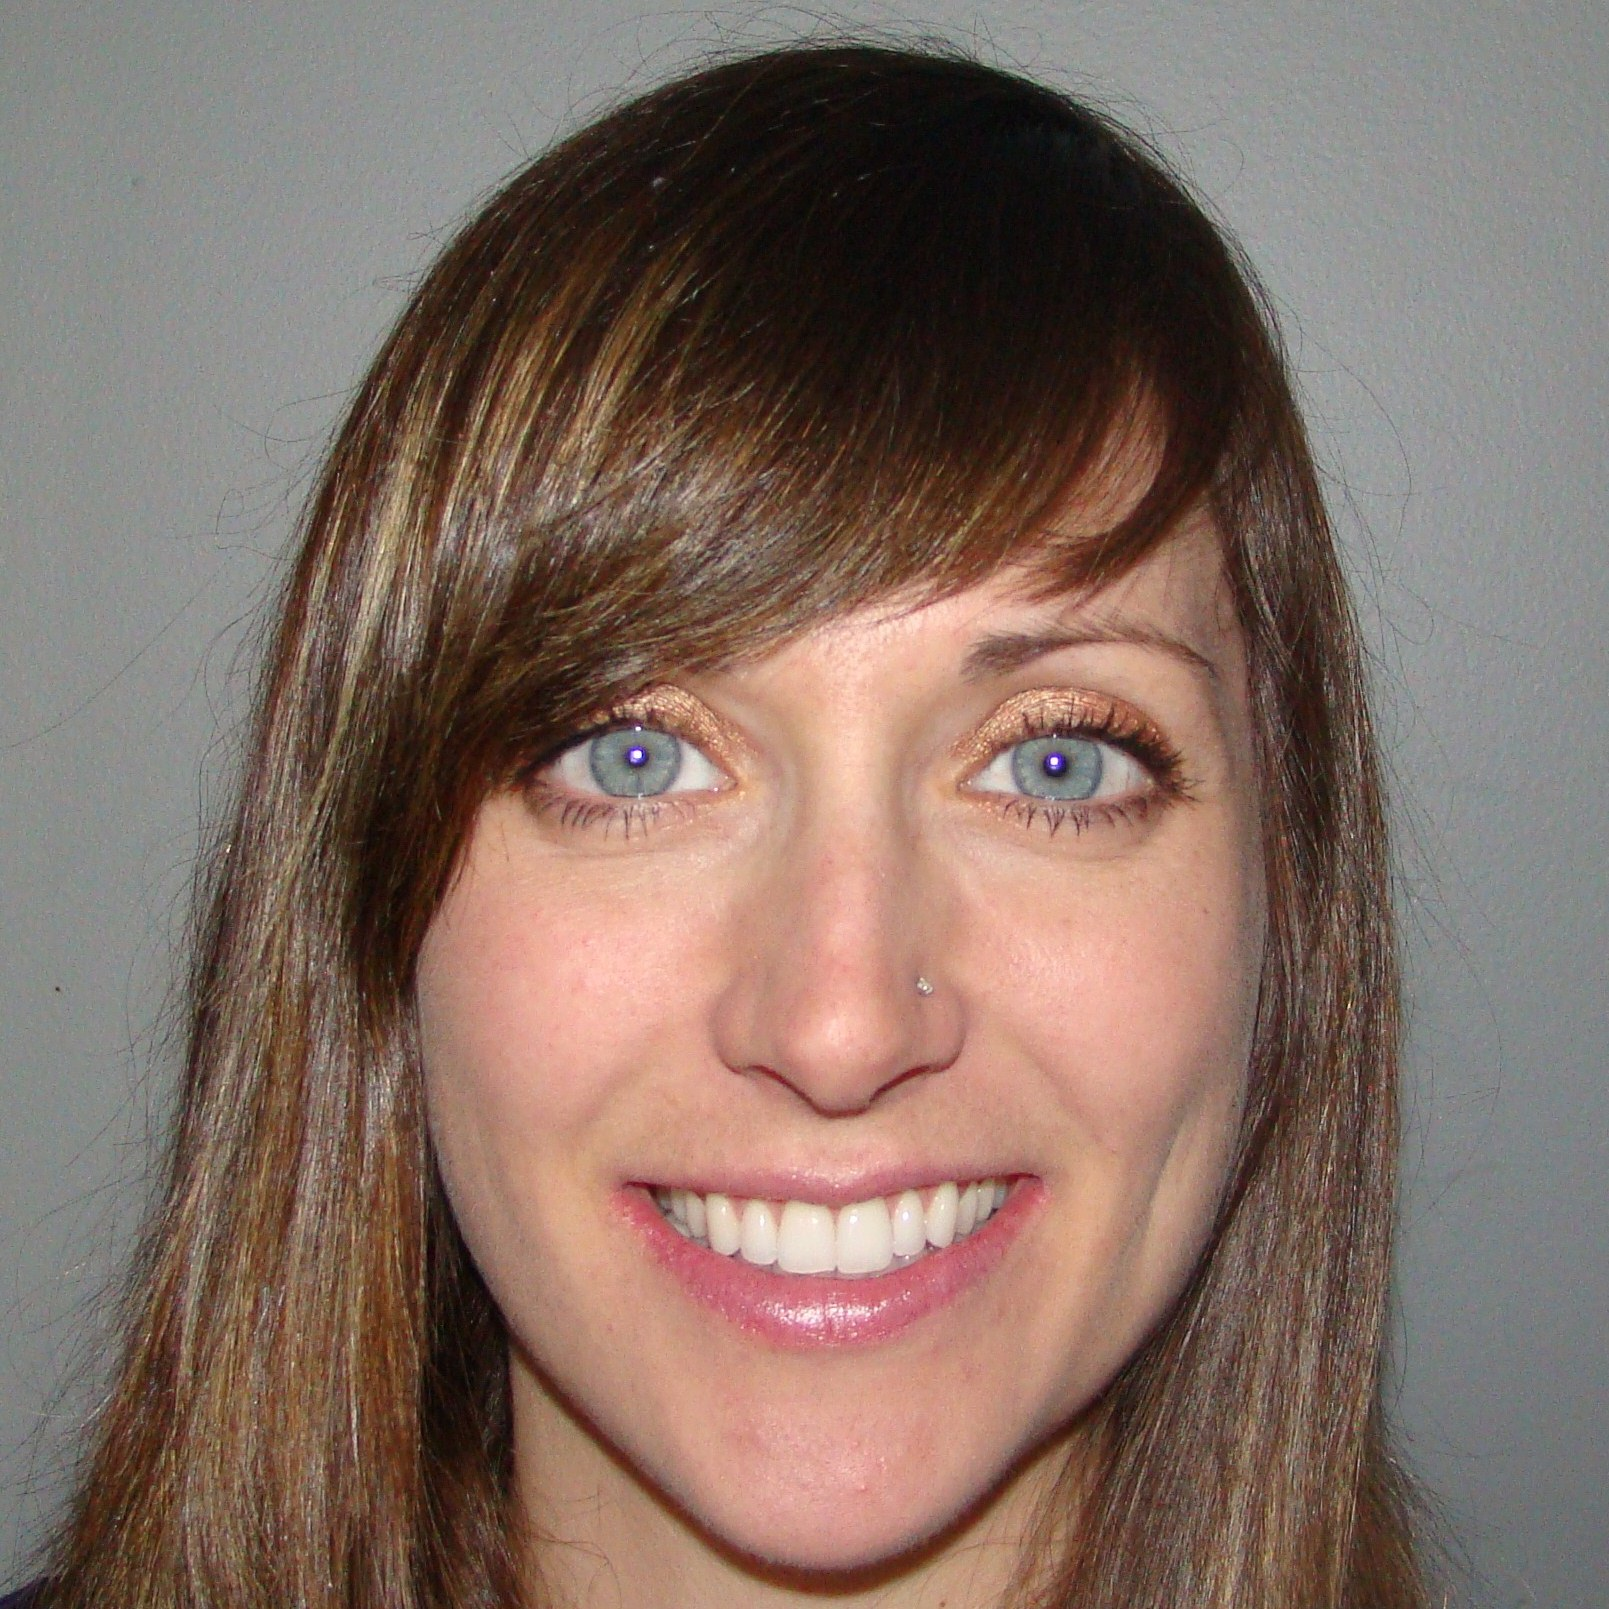 Rhonda Helman